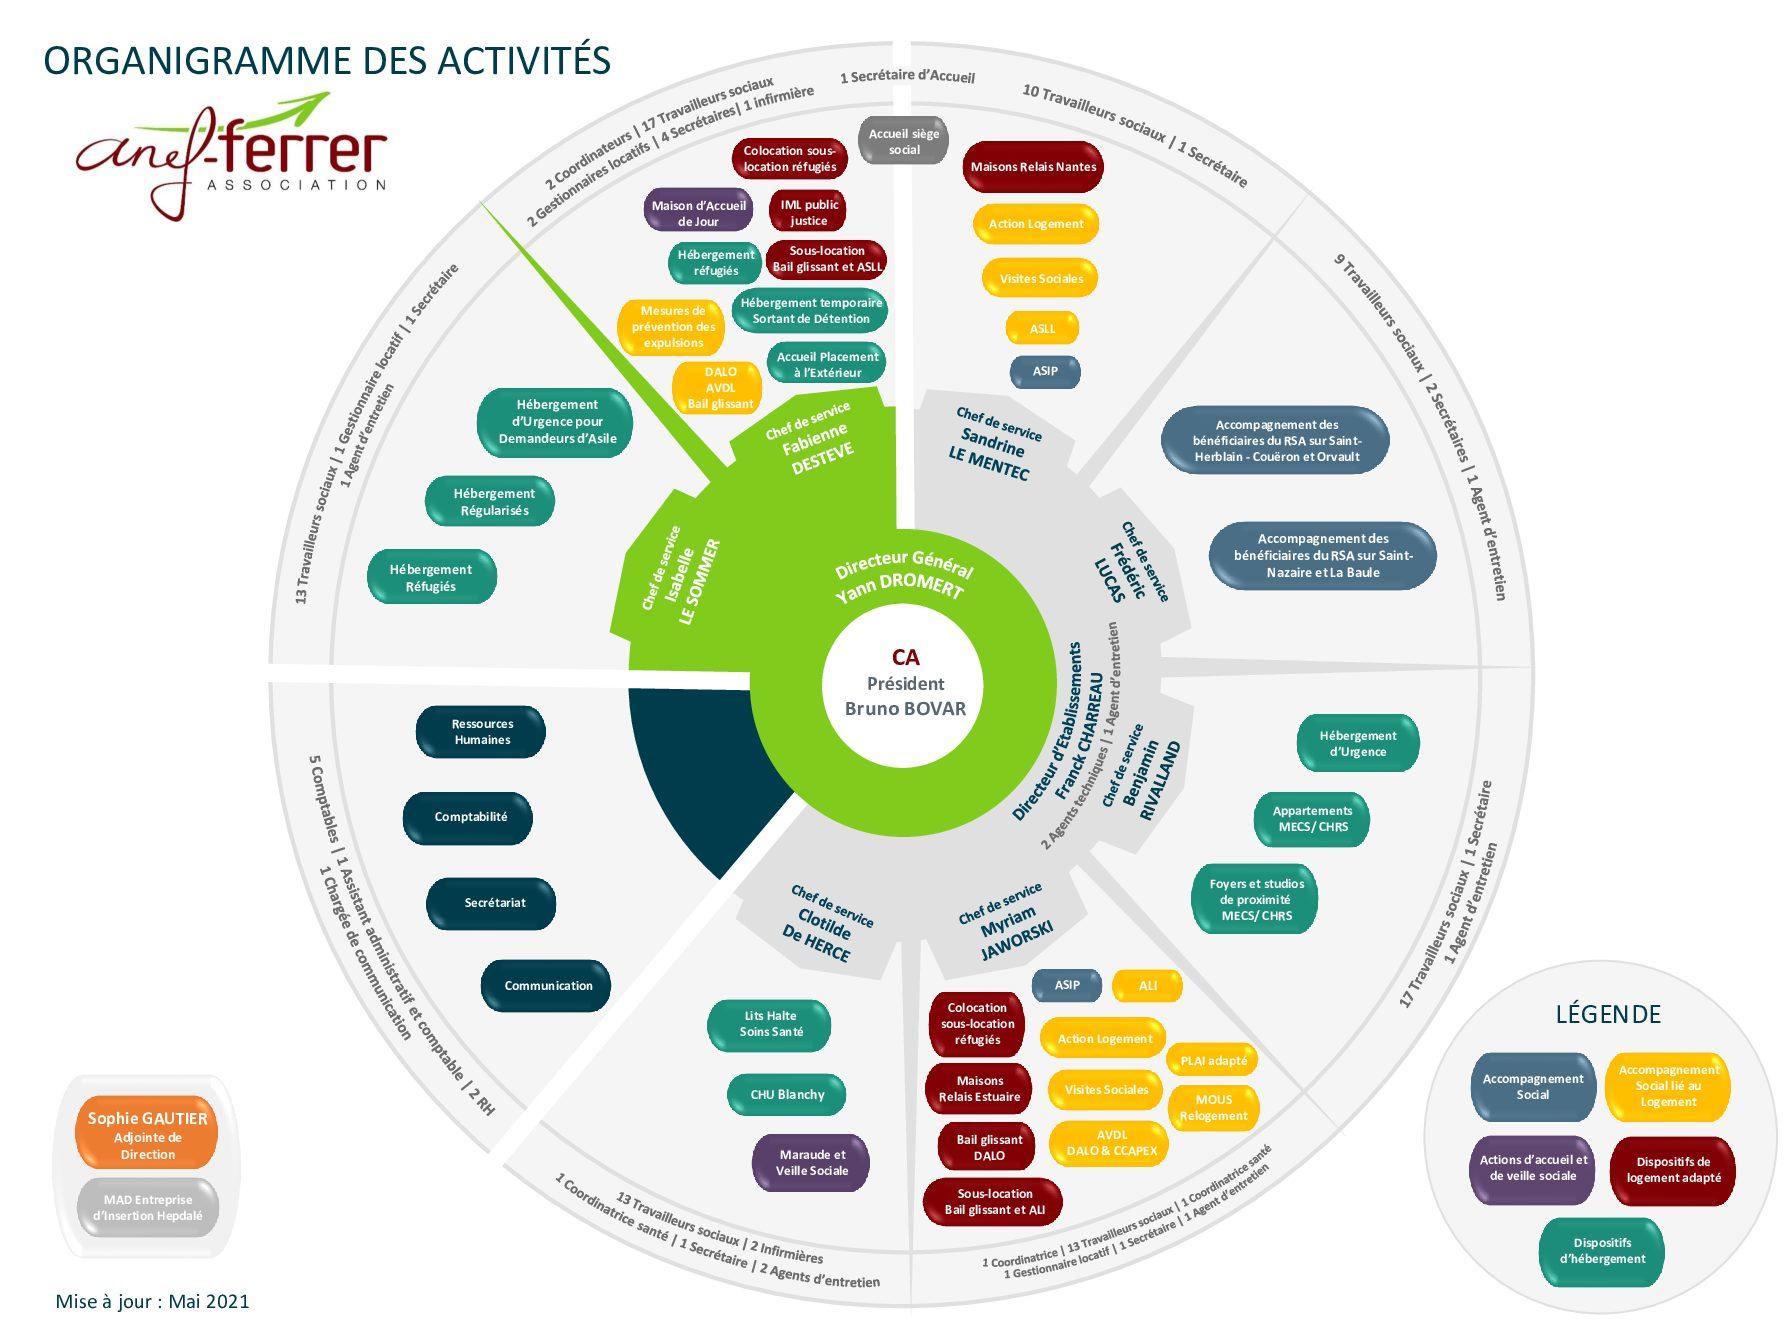 organigramme-des-activits-mai-2021